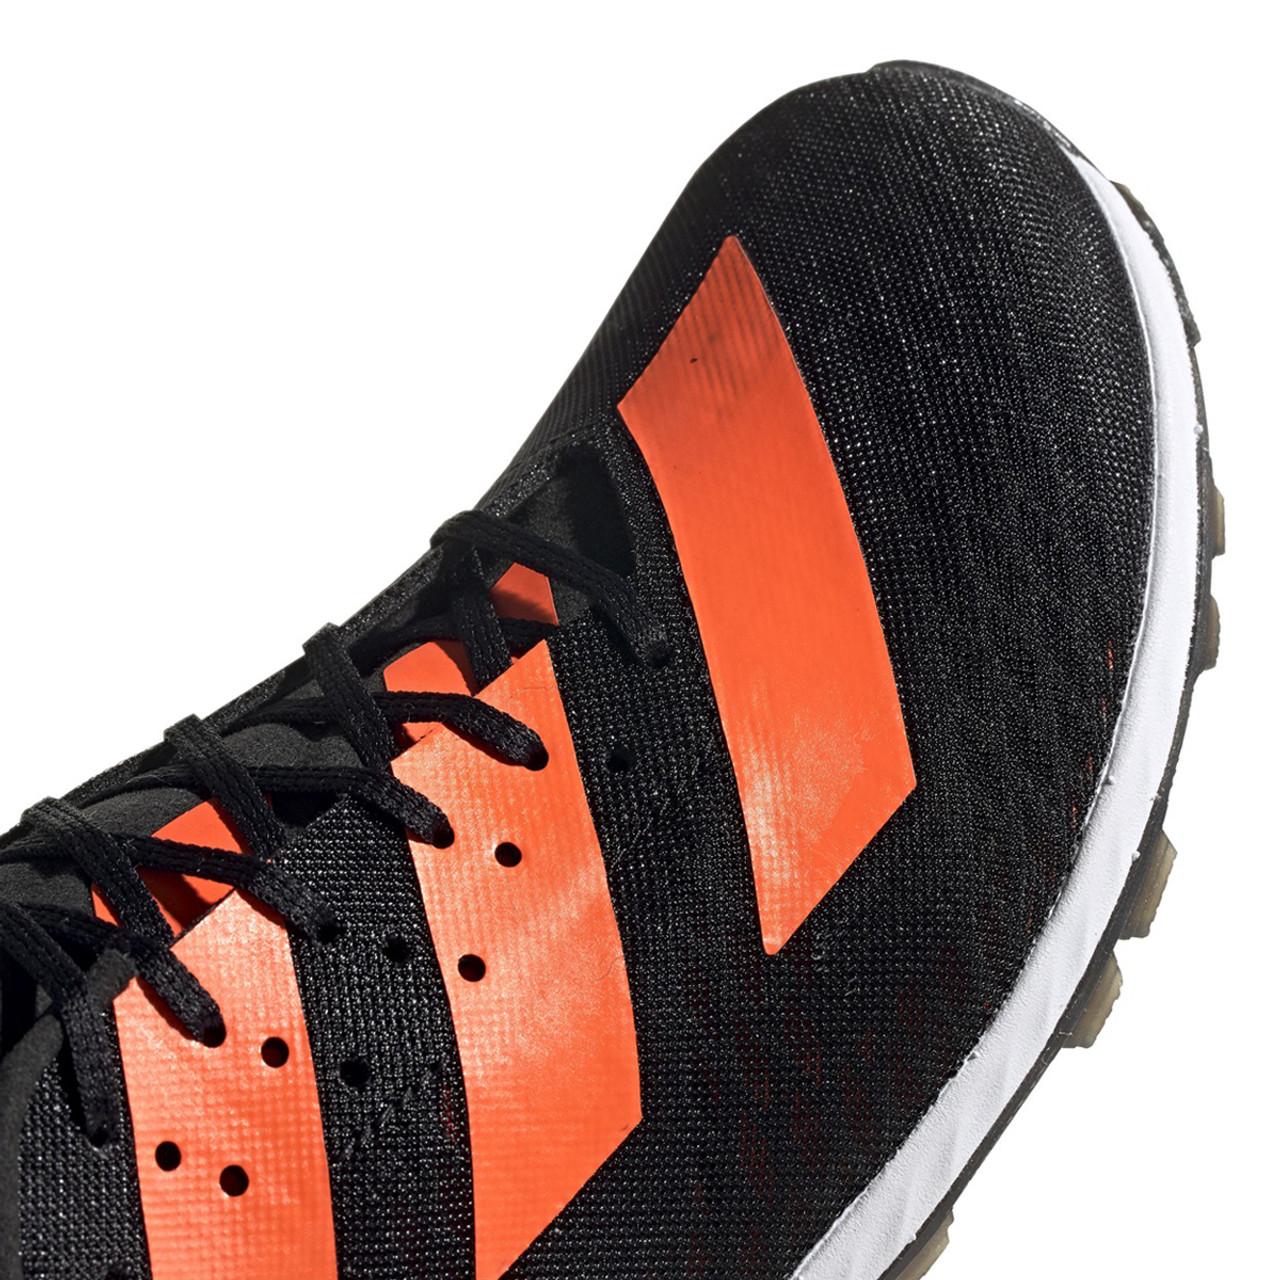 Adidas XCS 6 Men's Track Shoes B23479 Black, Green, White